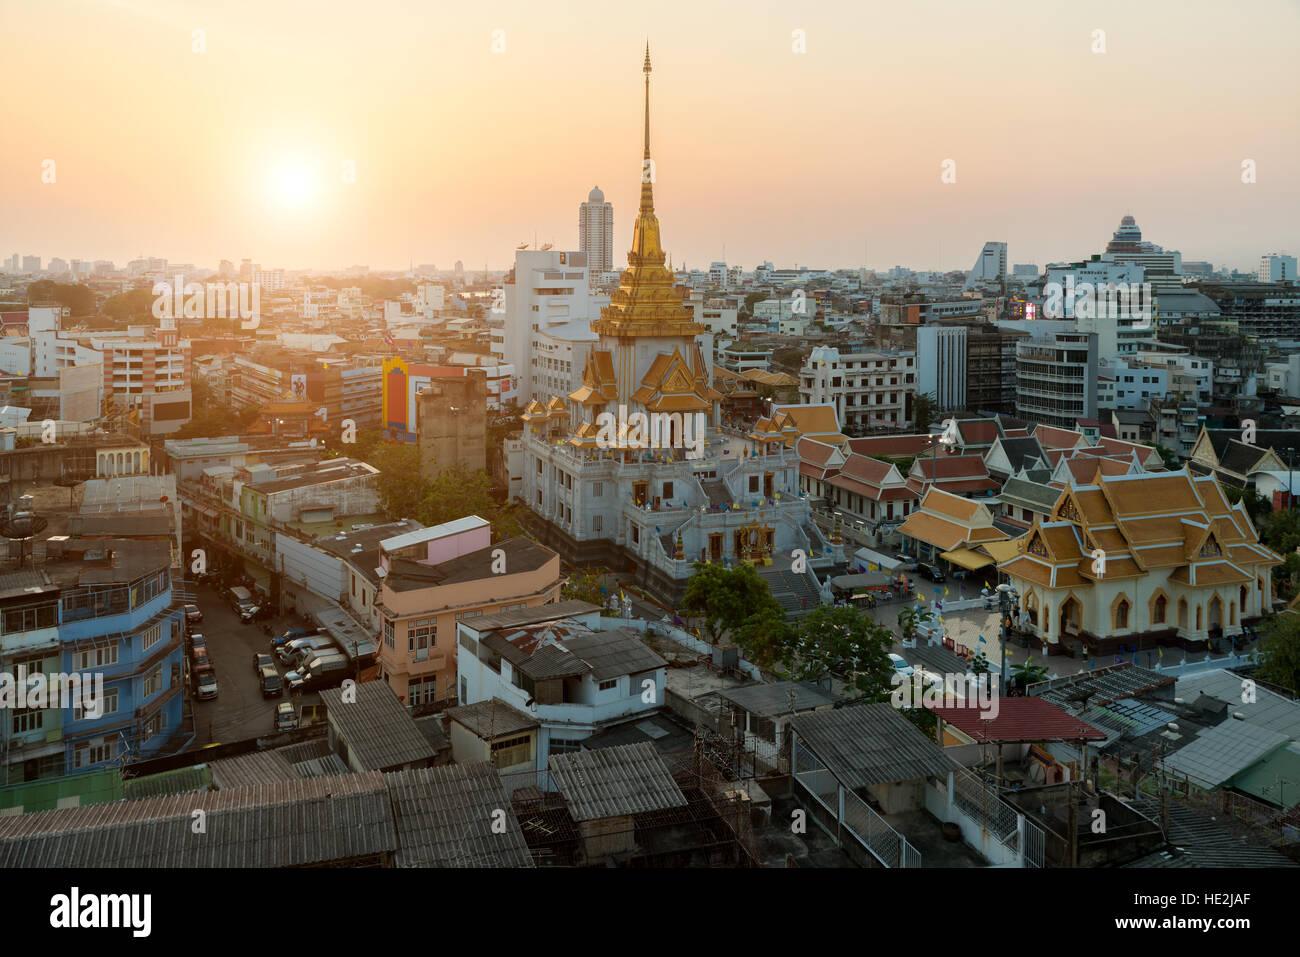 Wat Traimit dans China Town, dans Bangkok, Thaïlande Photo Stock